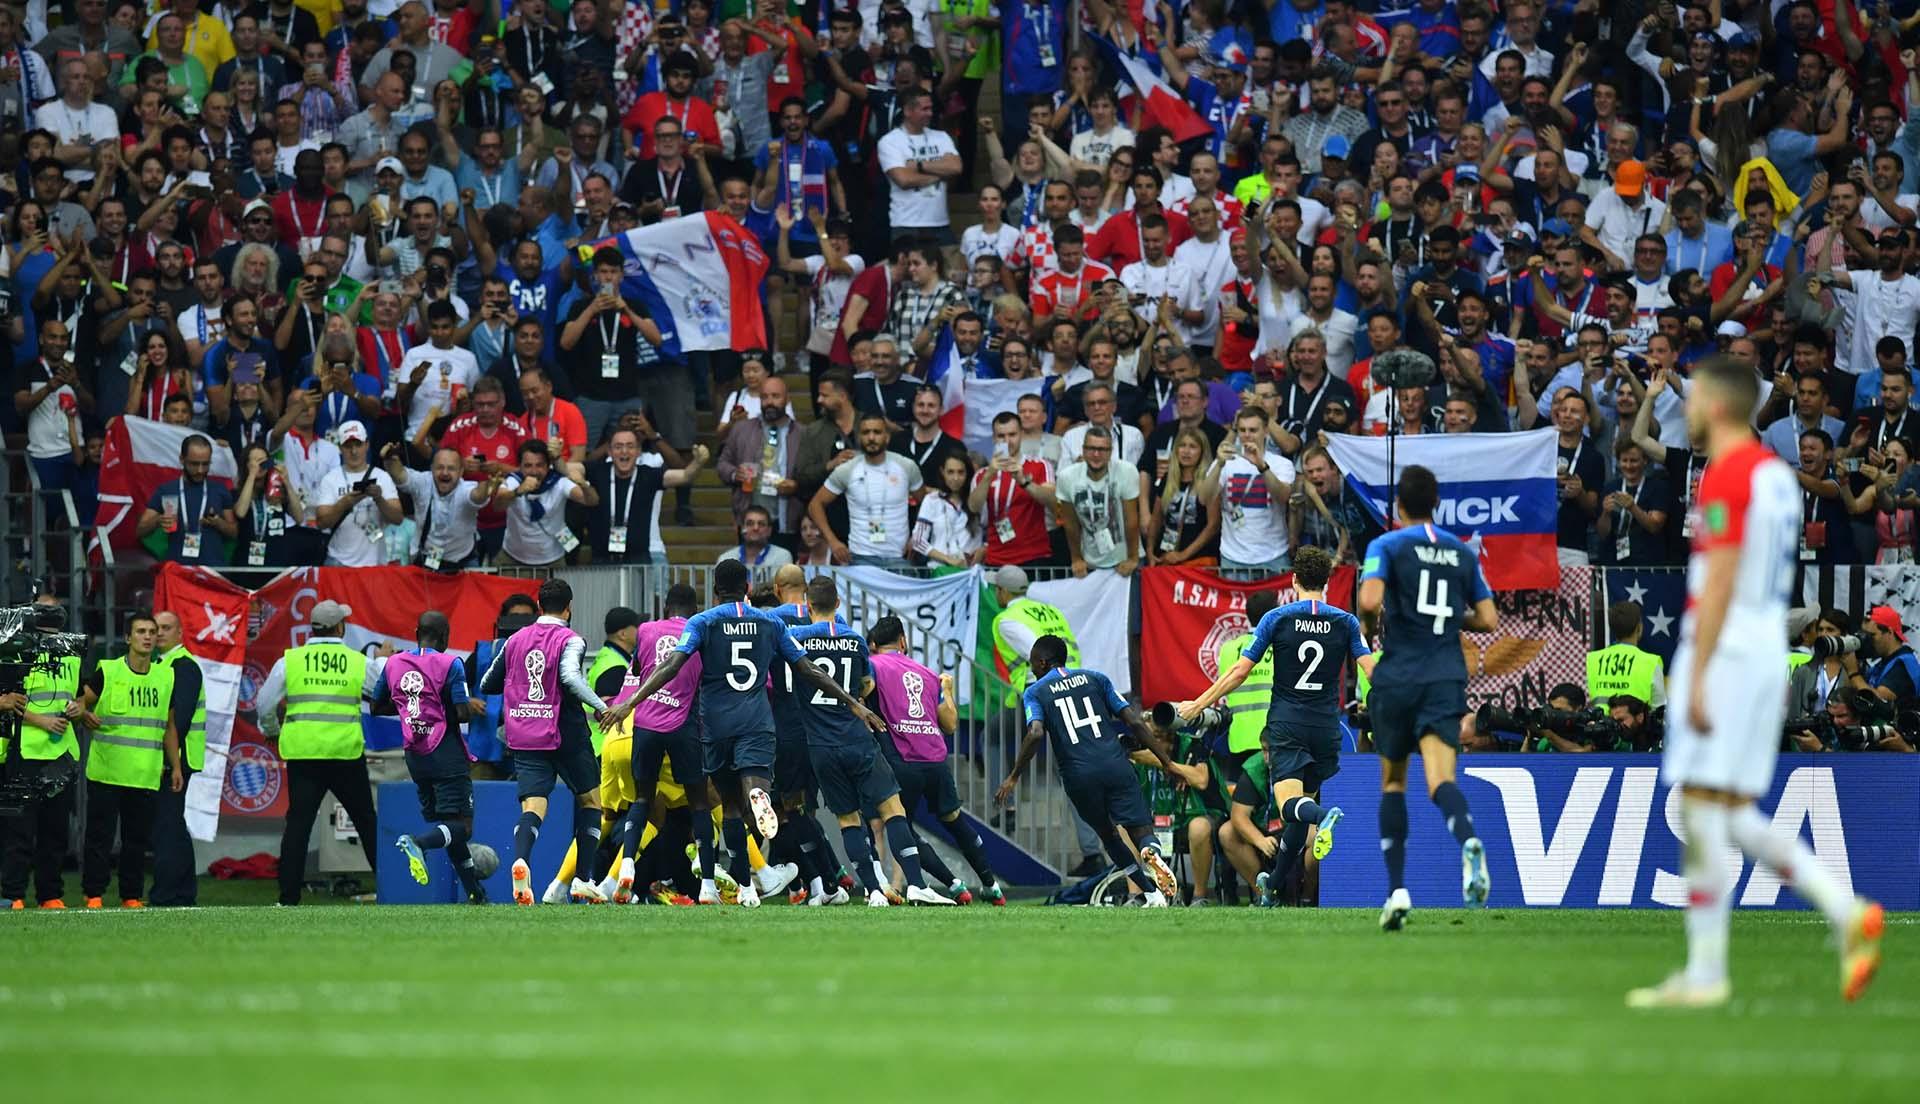 Francia embolsó 38 millones de dólares por ser campeón